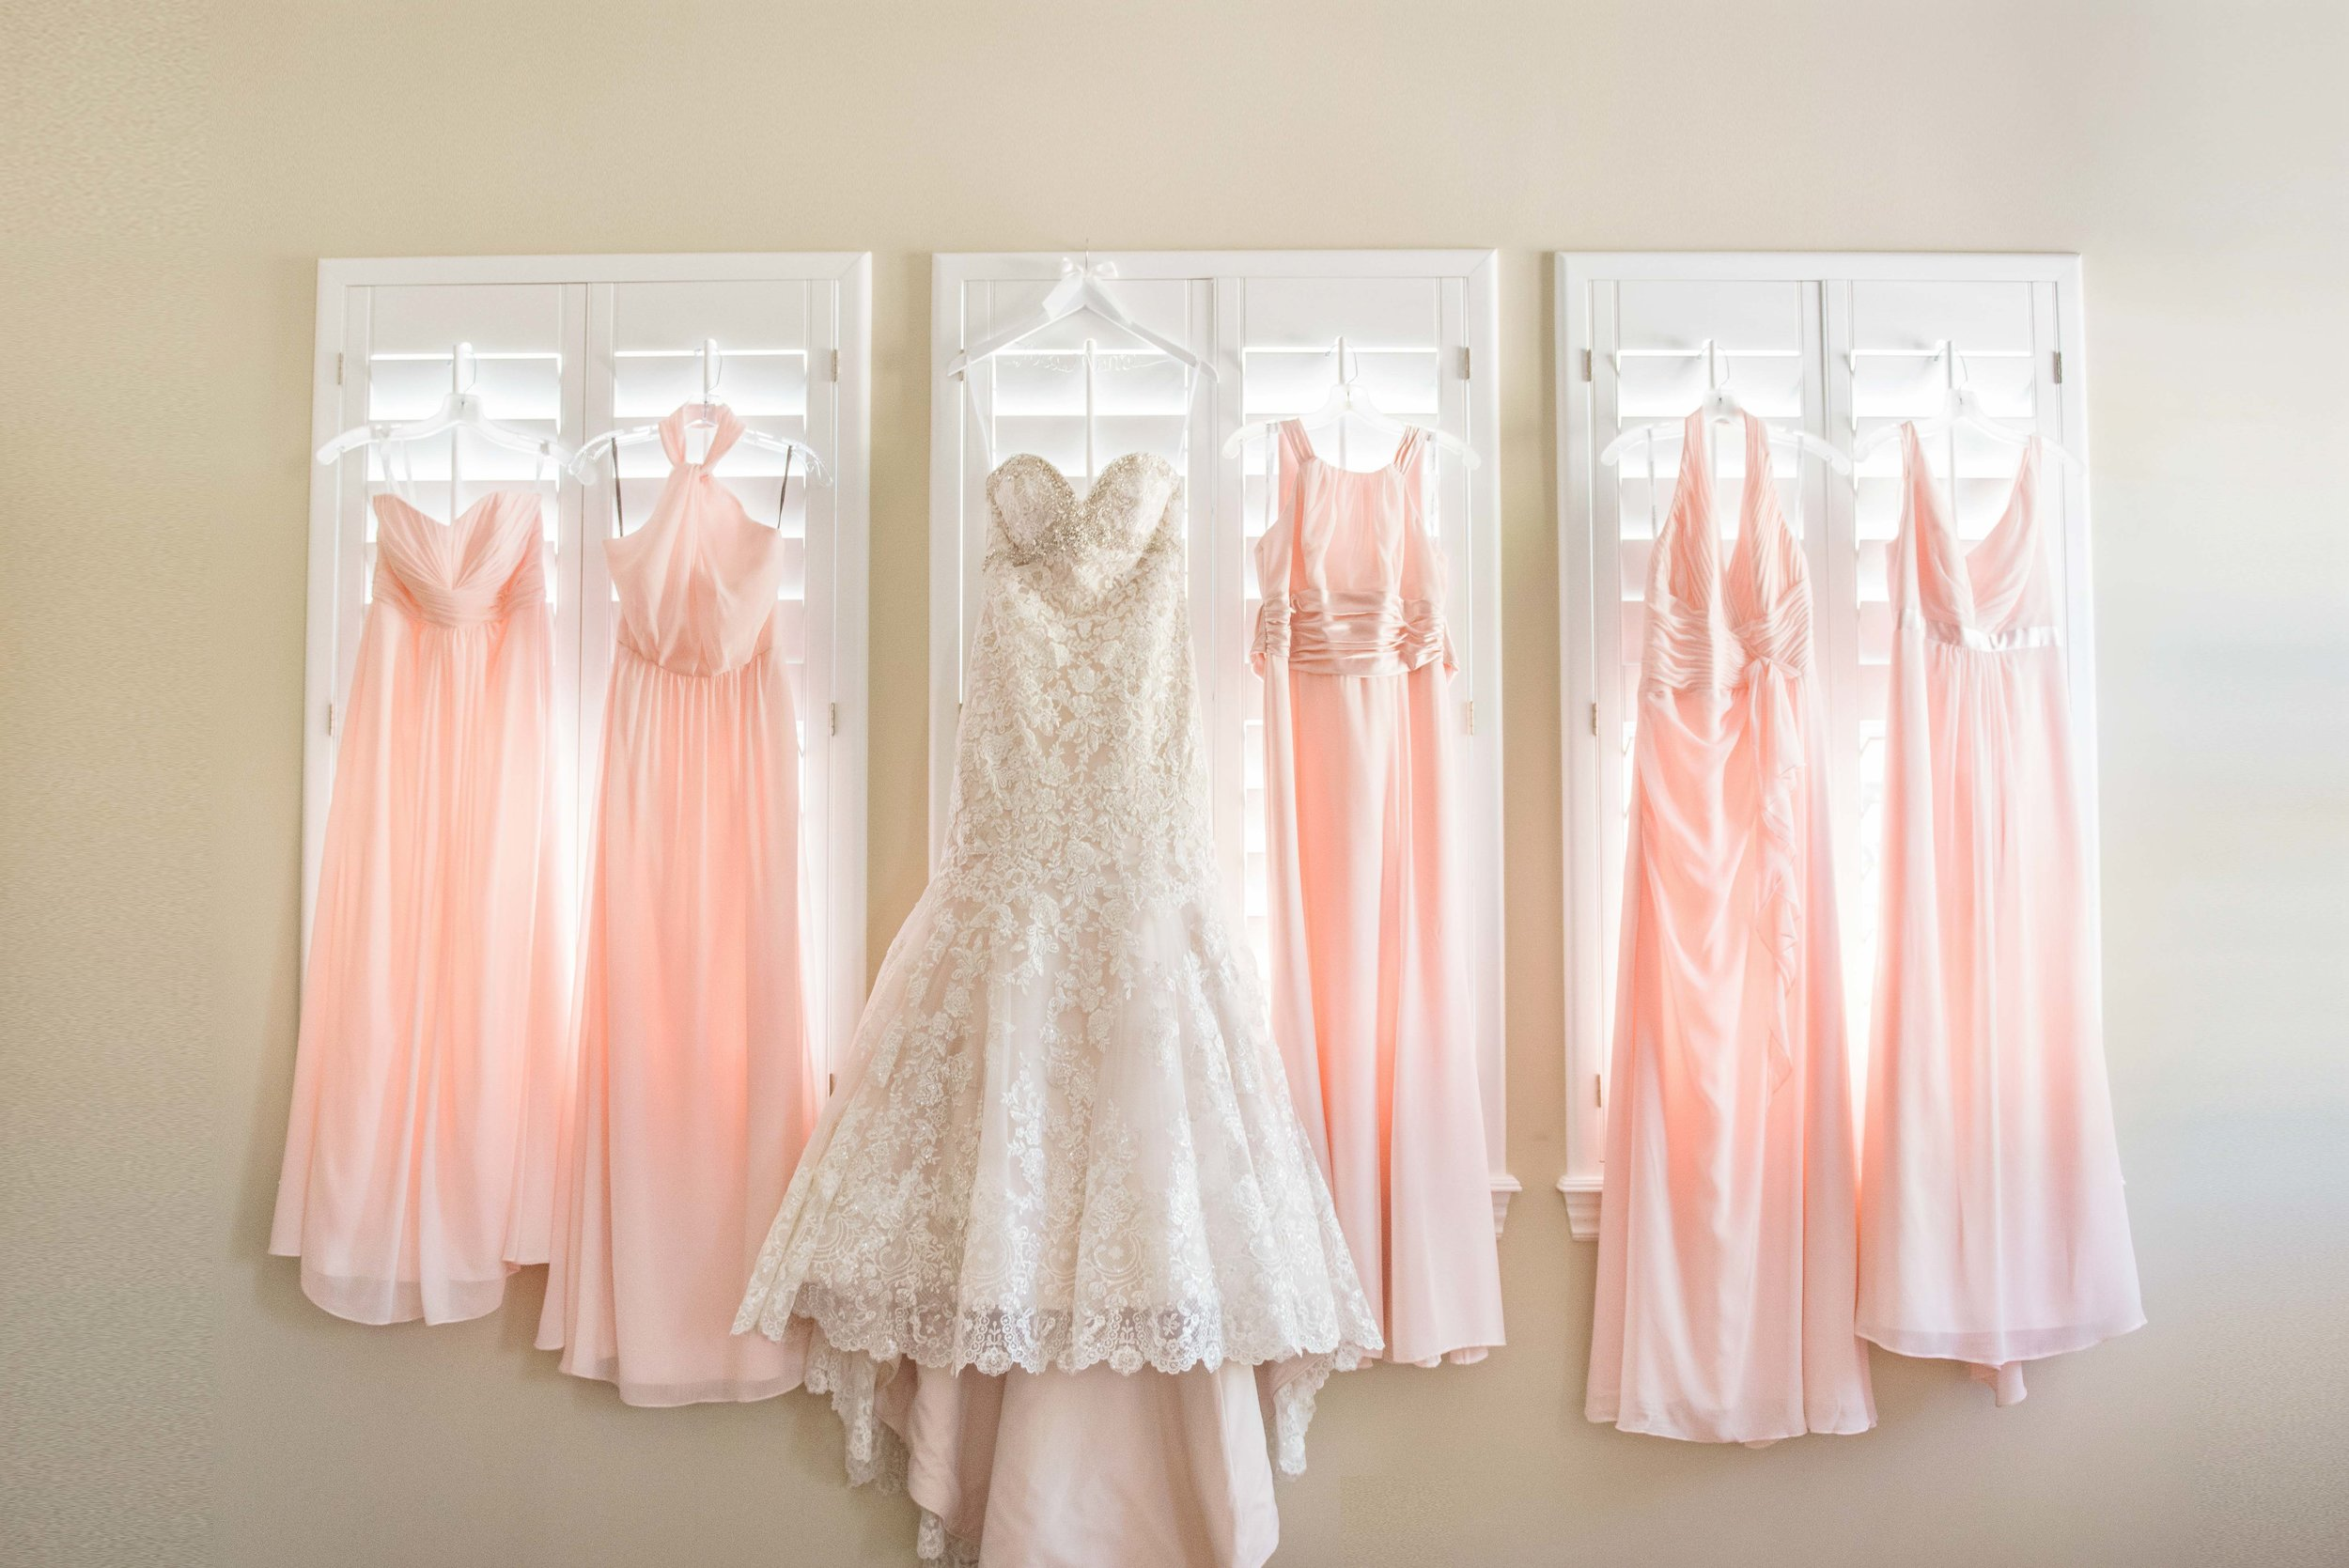 weddingwebsitesmallerpics-145.jpg